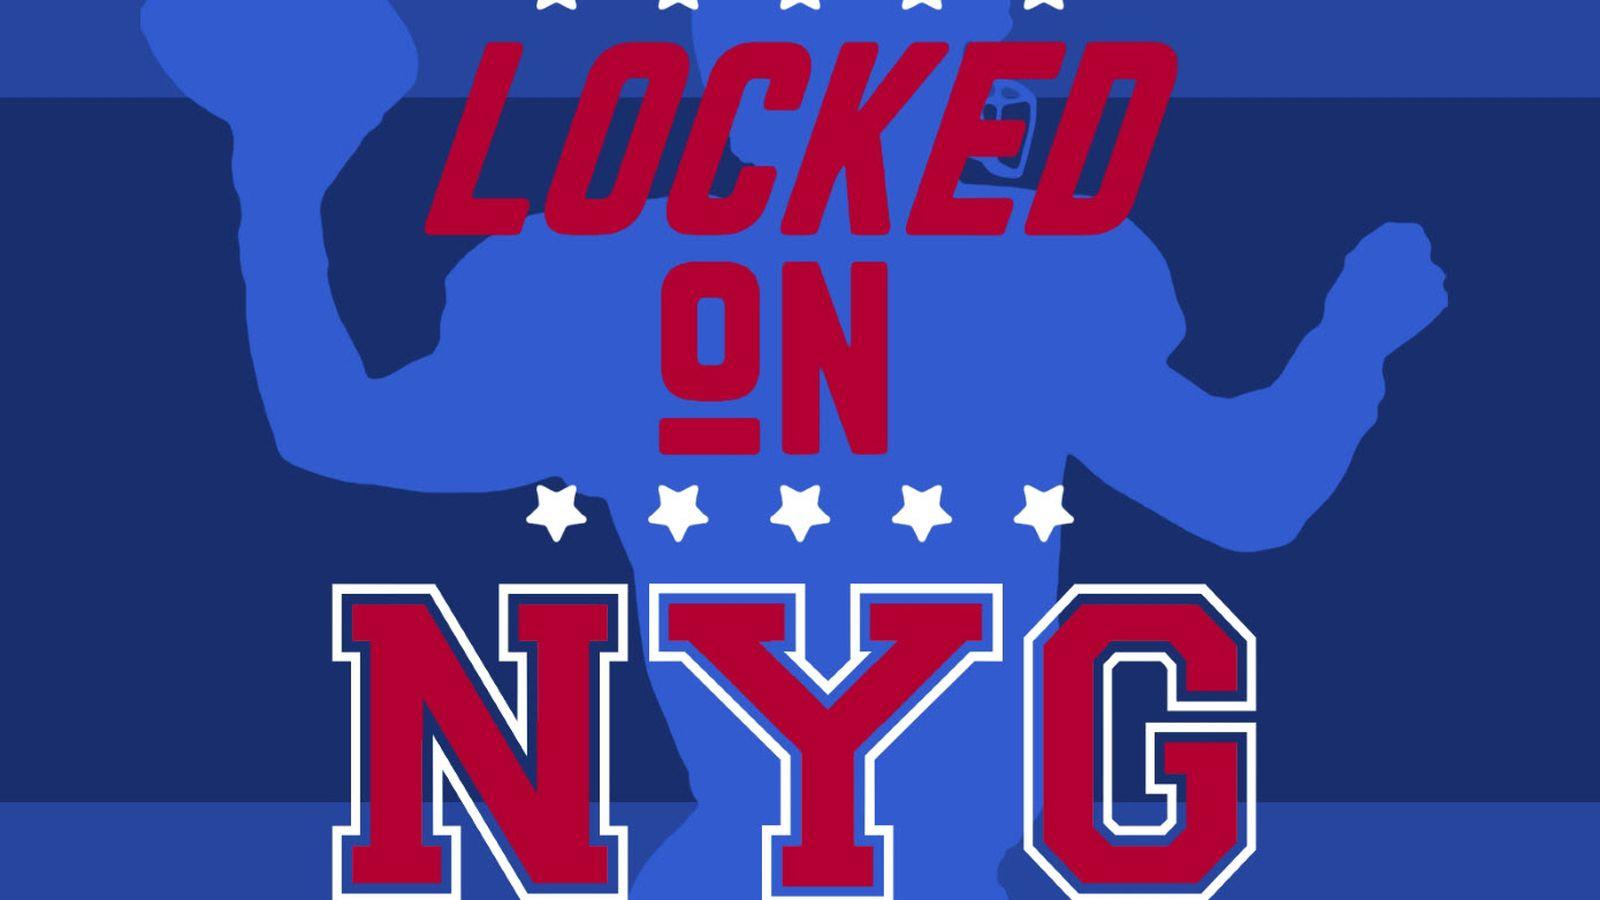 Lockedonnyg_logo02.0